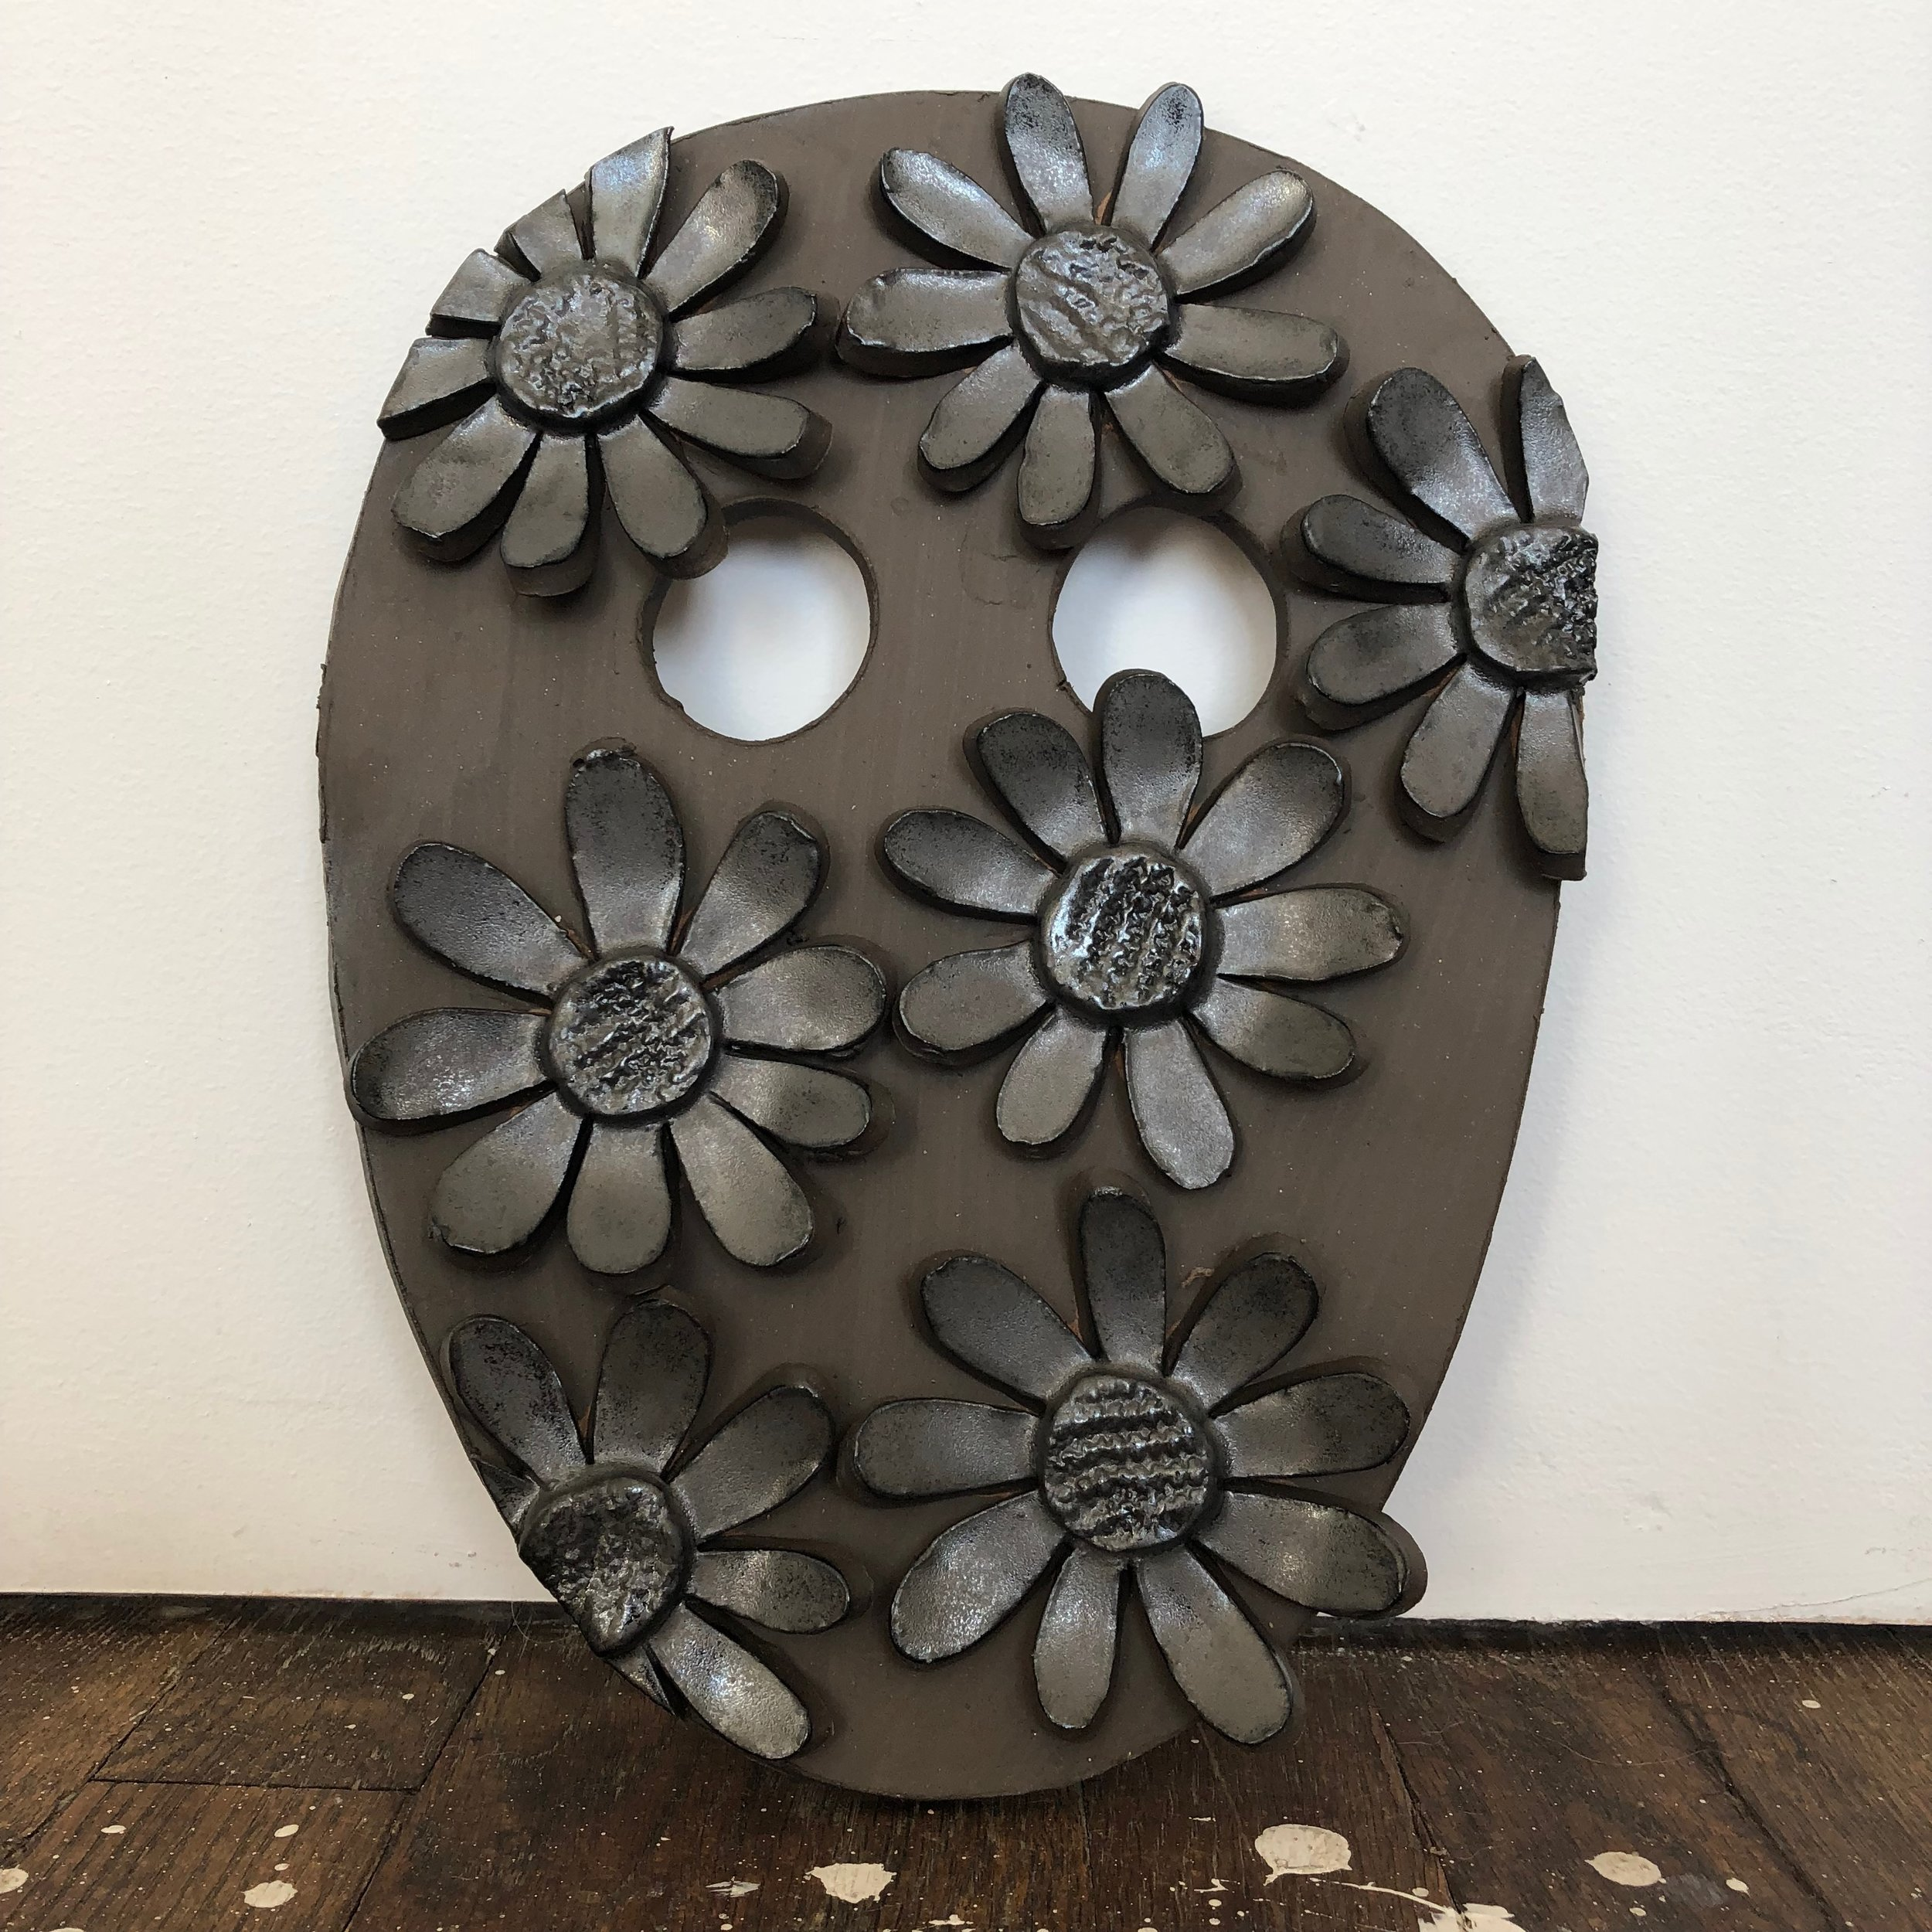 Untitled, 2019, glazed ceramic, 12 x 9 x 1 inches